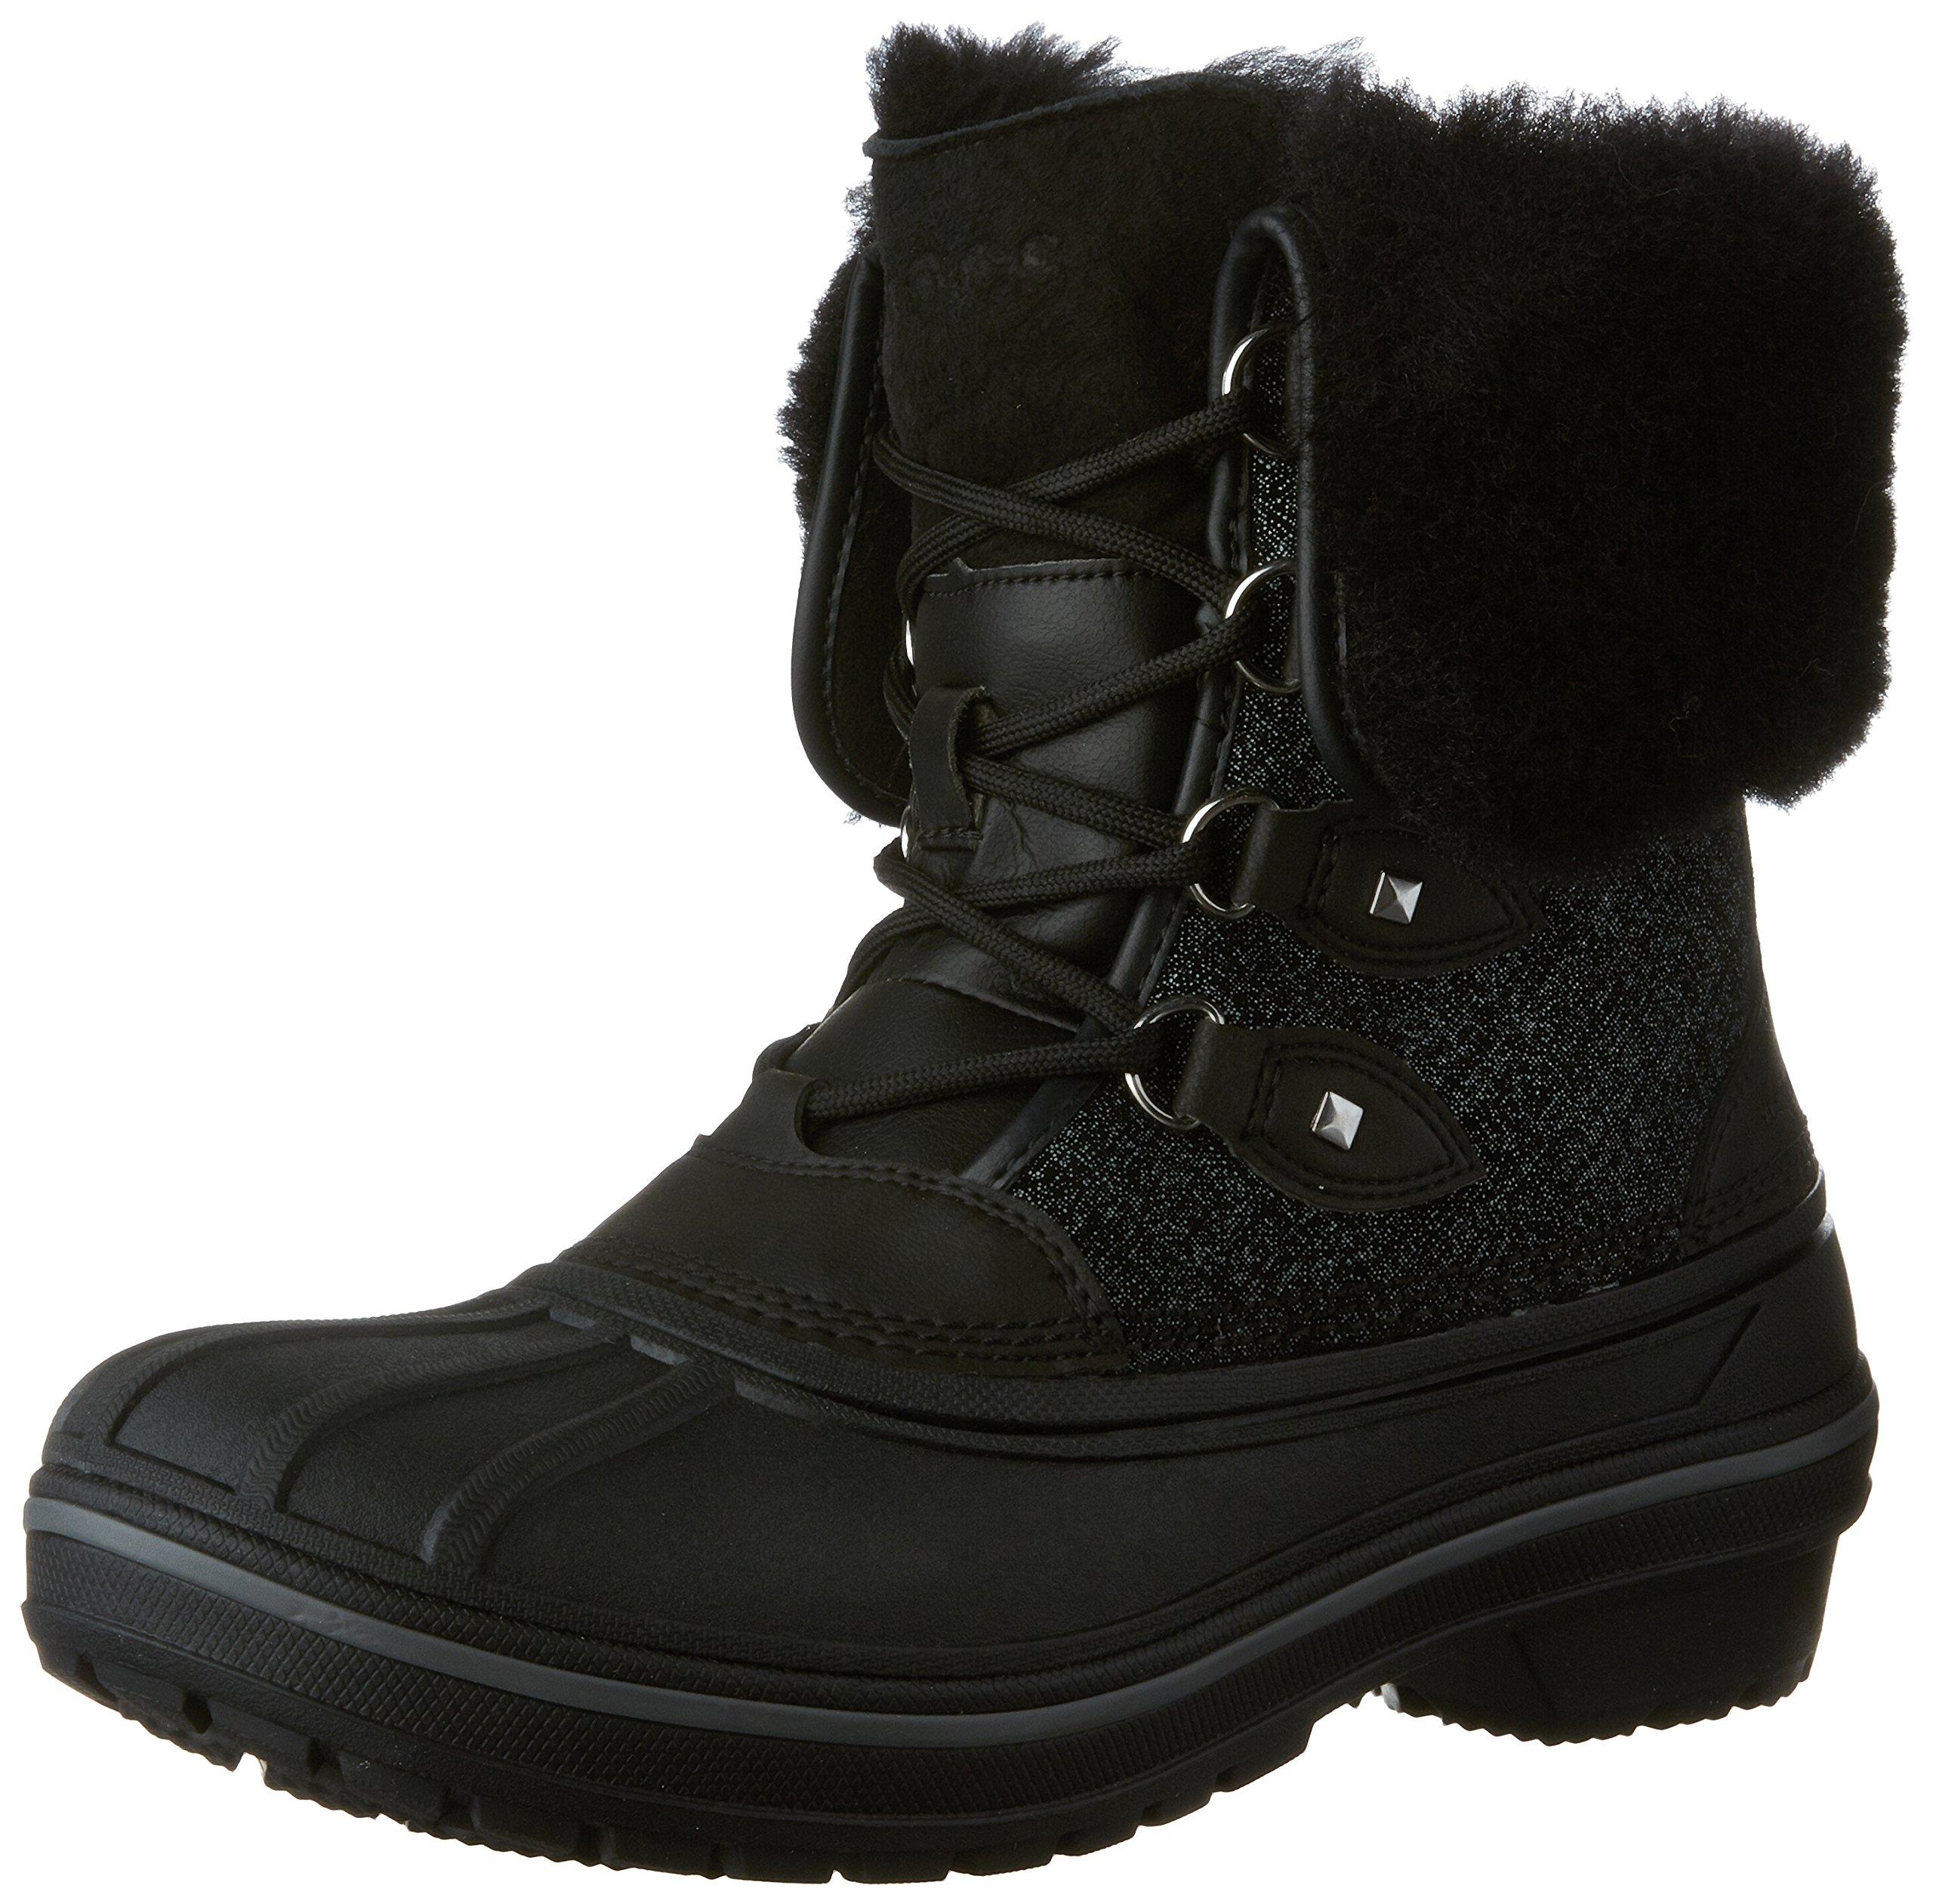 Crocs Women's AllCast II Luxe Snow Boot, Black Shimmer, 8 M US